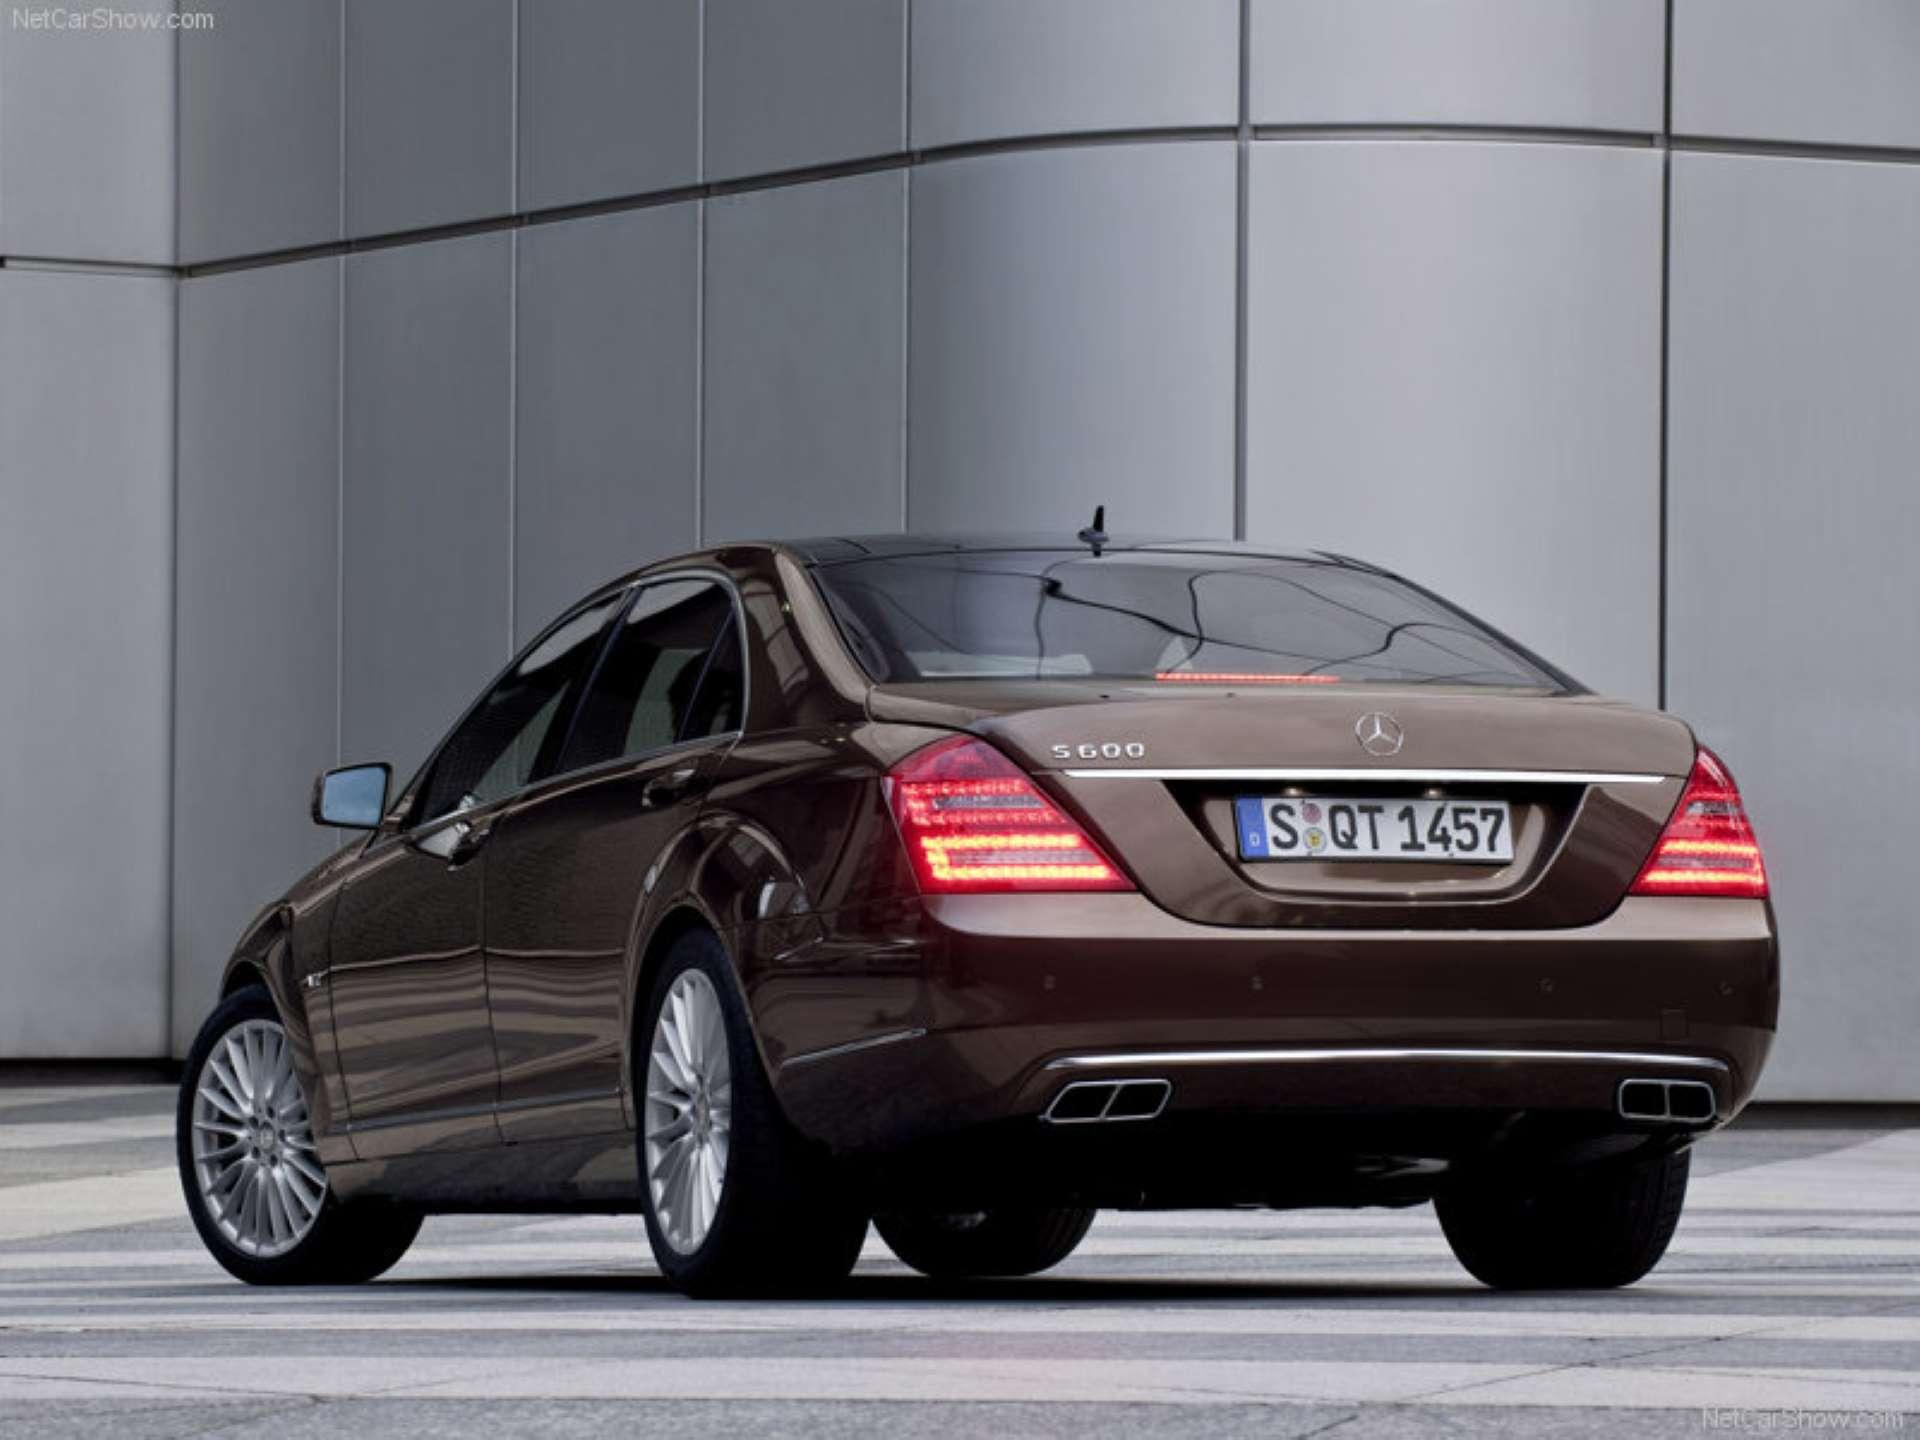 Best RWD Cars under 25K Mercedes-Benz W221 rear